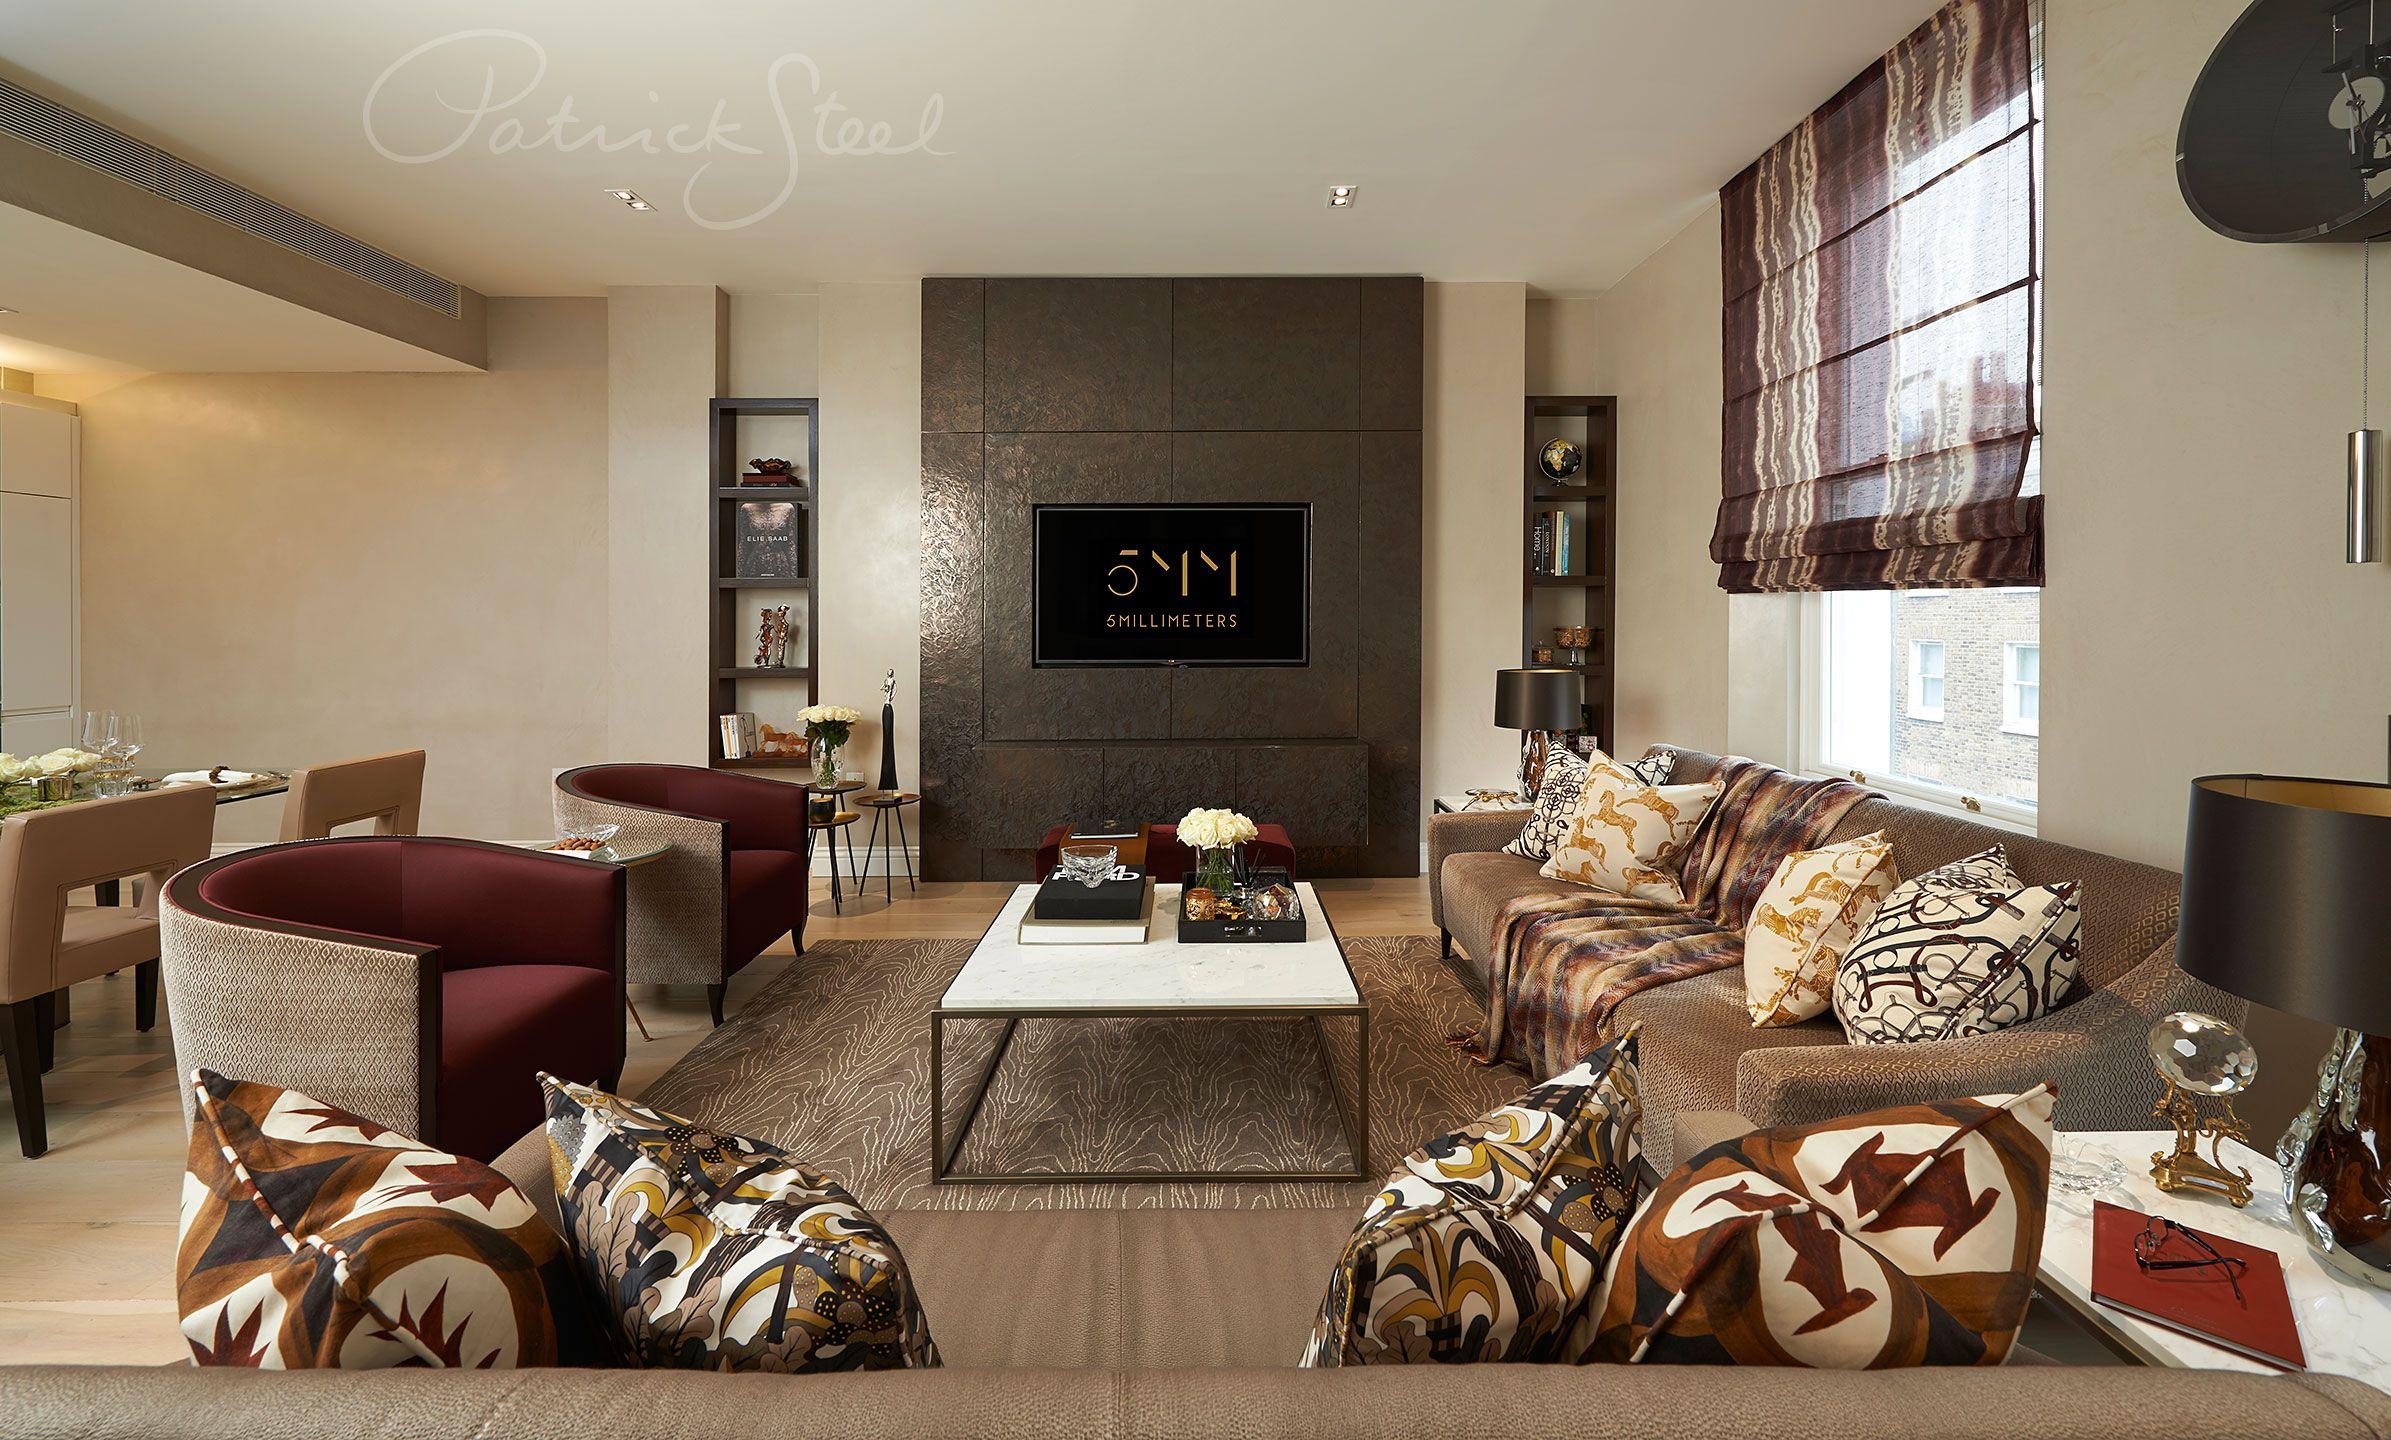 a8700d5a5b4415dc5327dff41fad0308 Top Result 50 Elegant Design Living Room Online Photography 2017 Kgit4